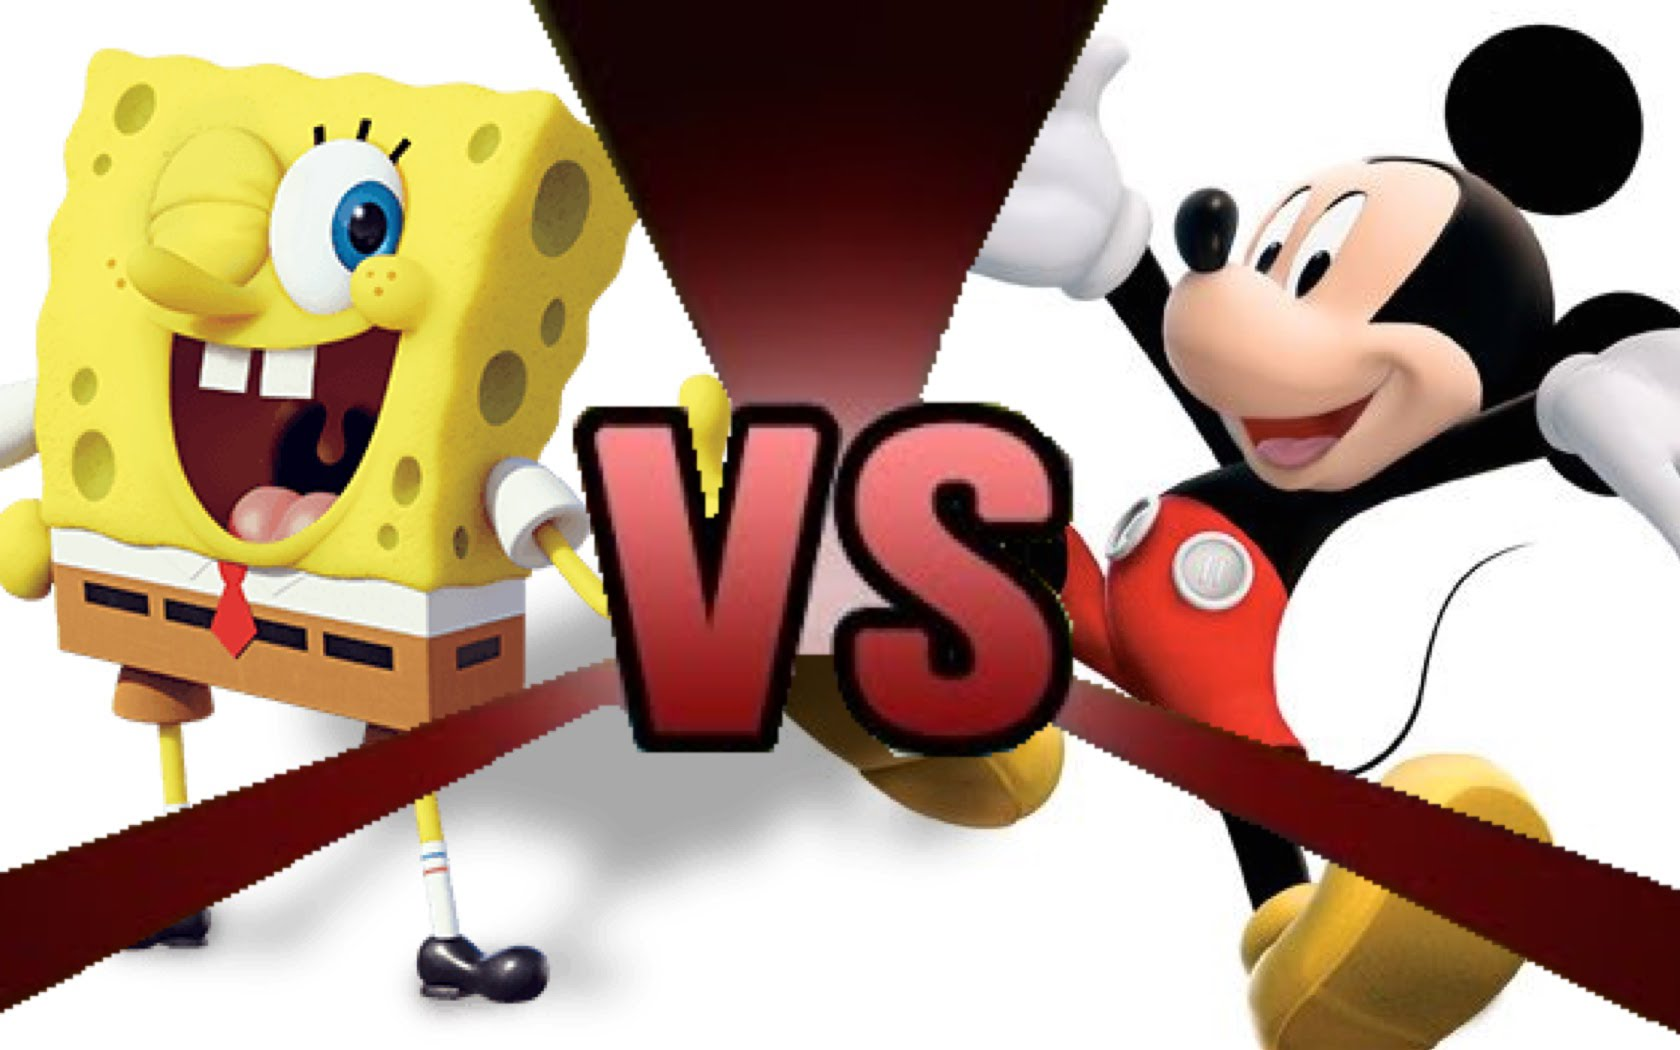 cartoon fight club spongebob squarepants vs mickey mouse tv